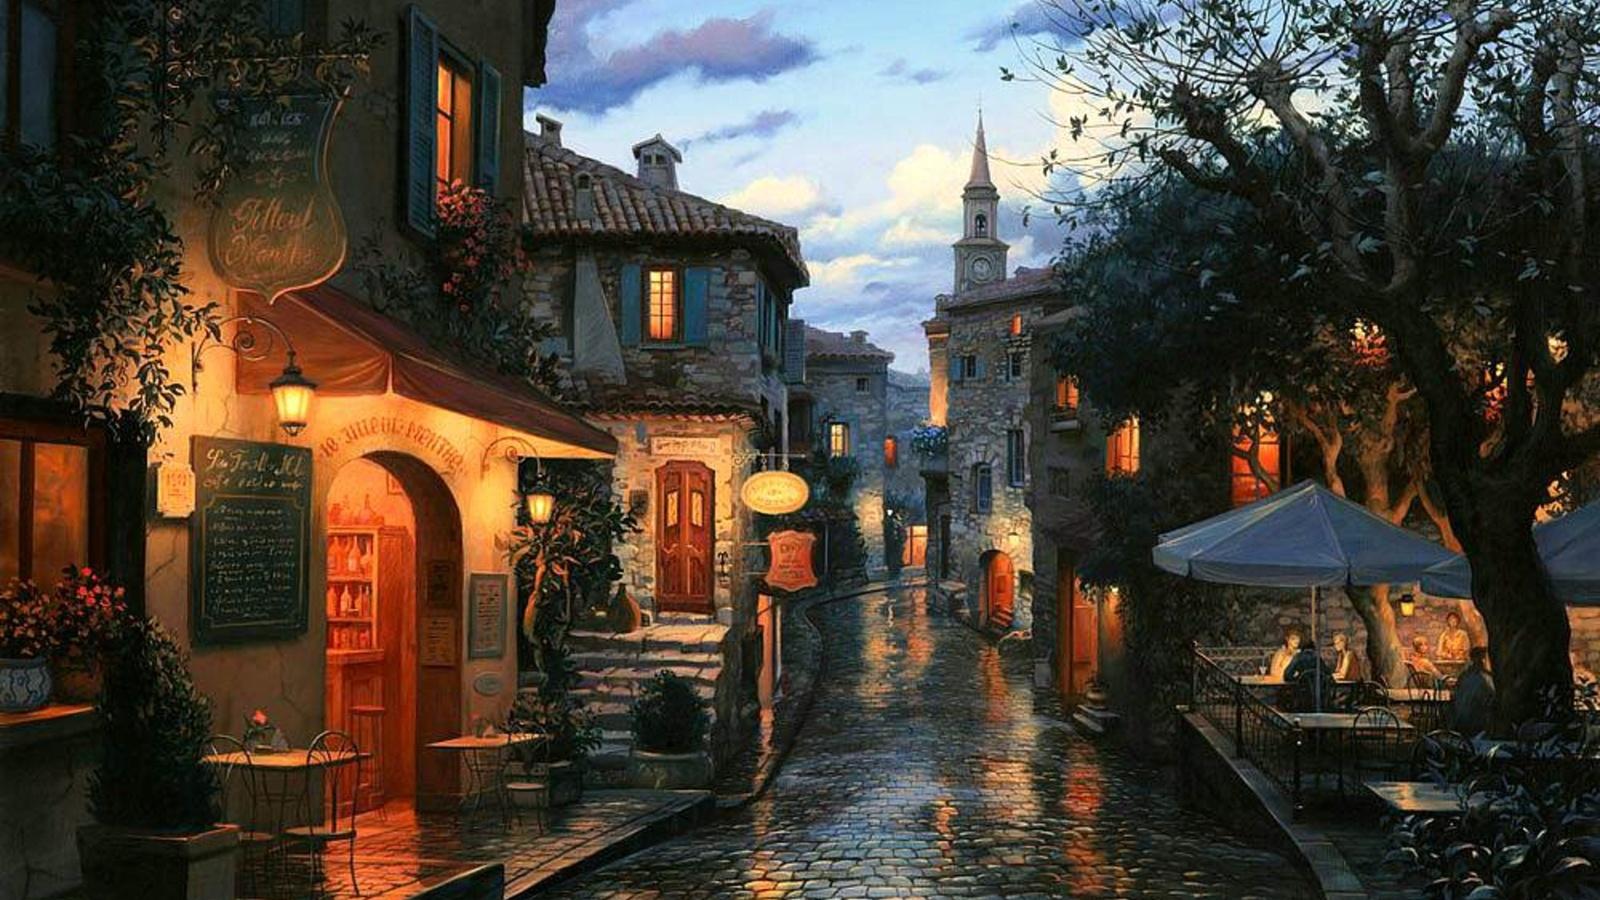 Magic evening, cafe, umbrellas, tables, evening, eugeny lushpin, painting, houses, street, bar